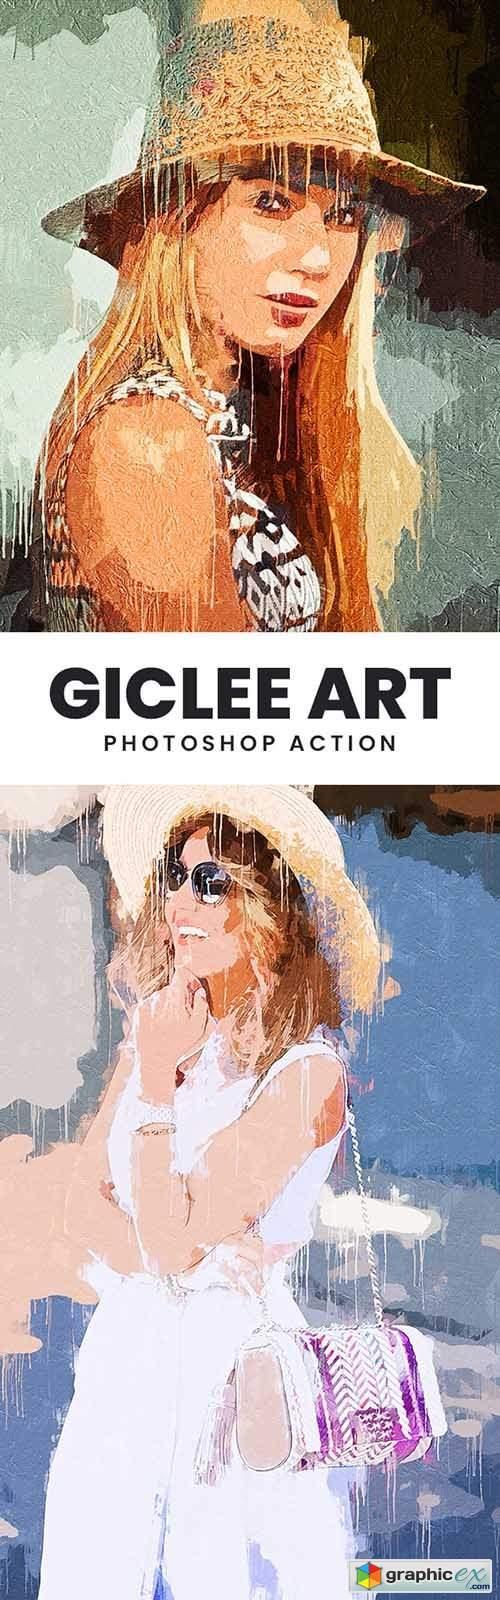 Giclee Art Photoshop Action